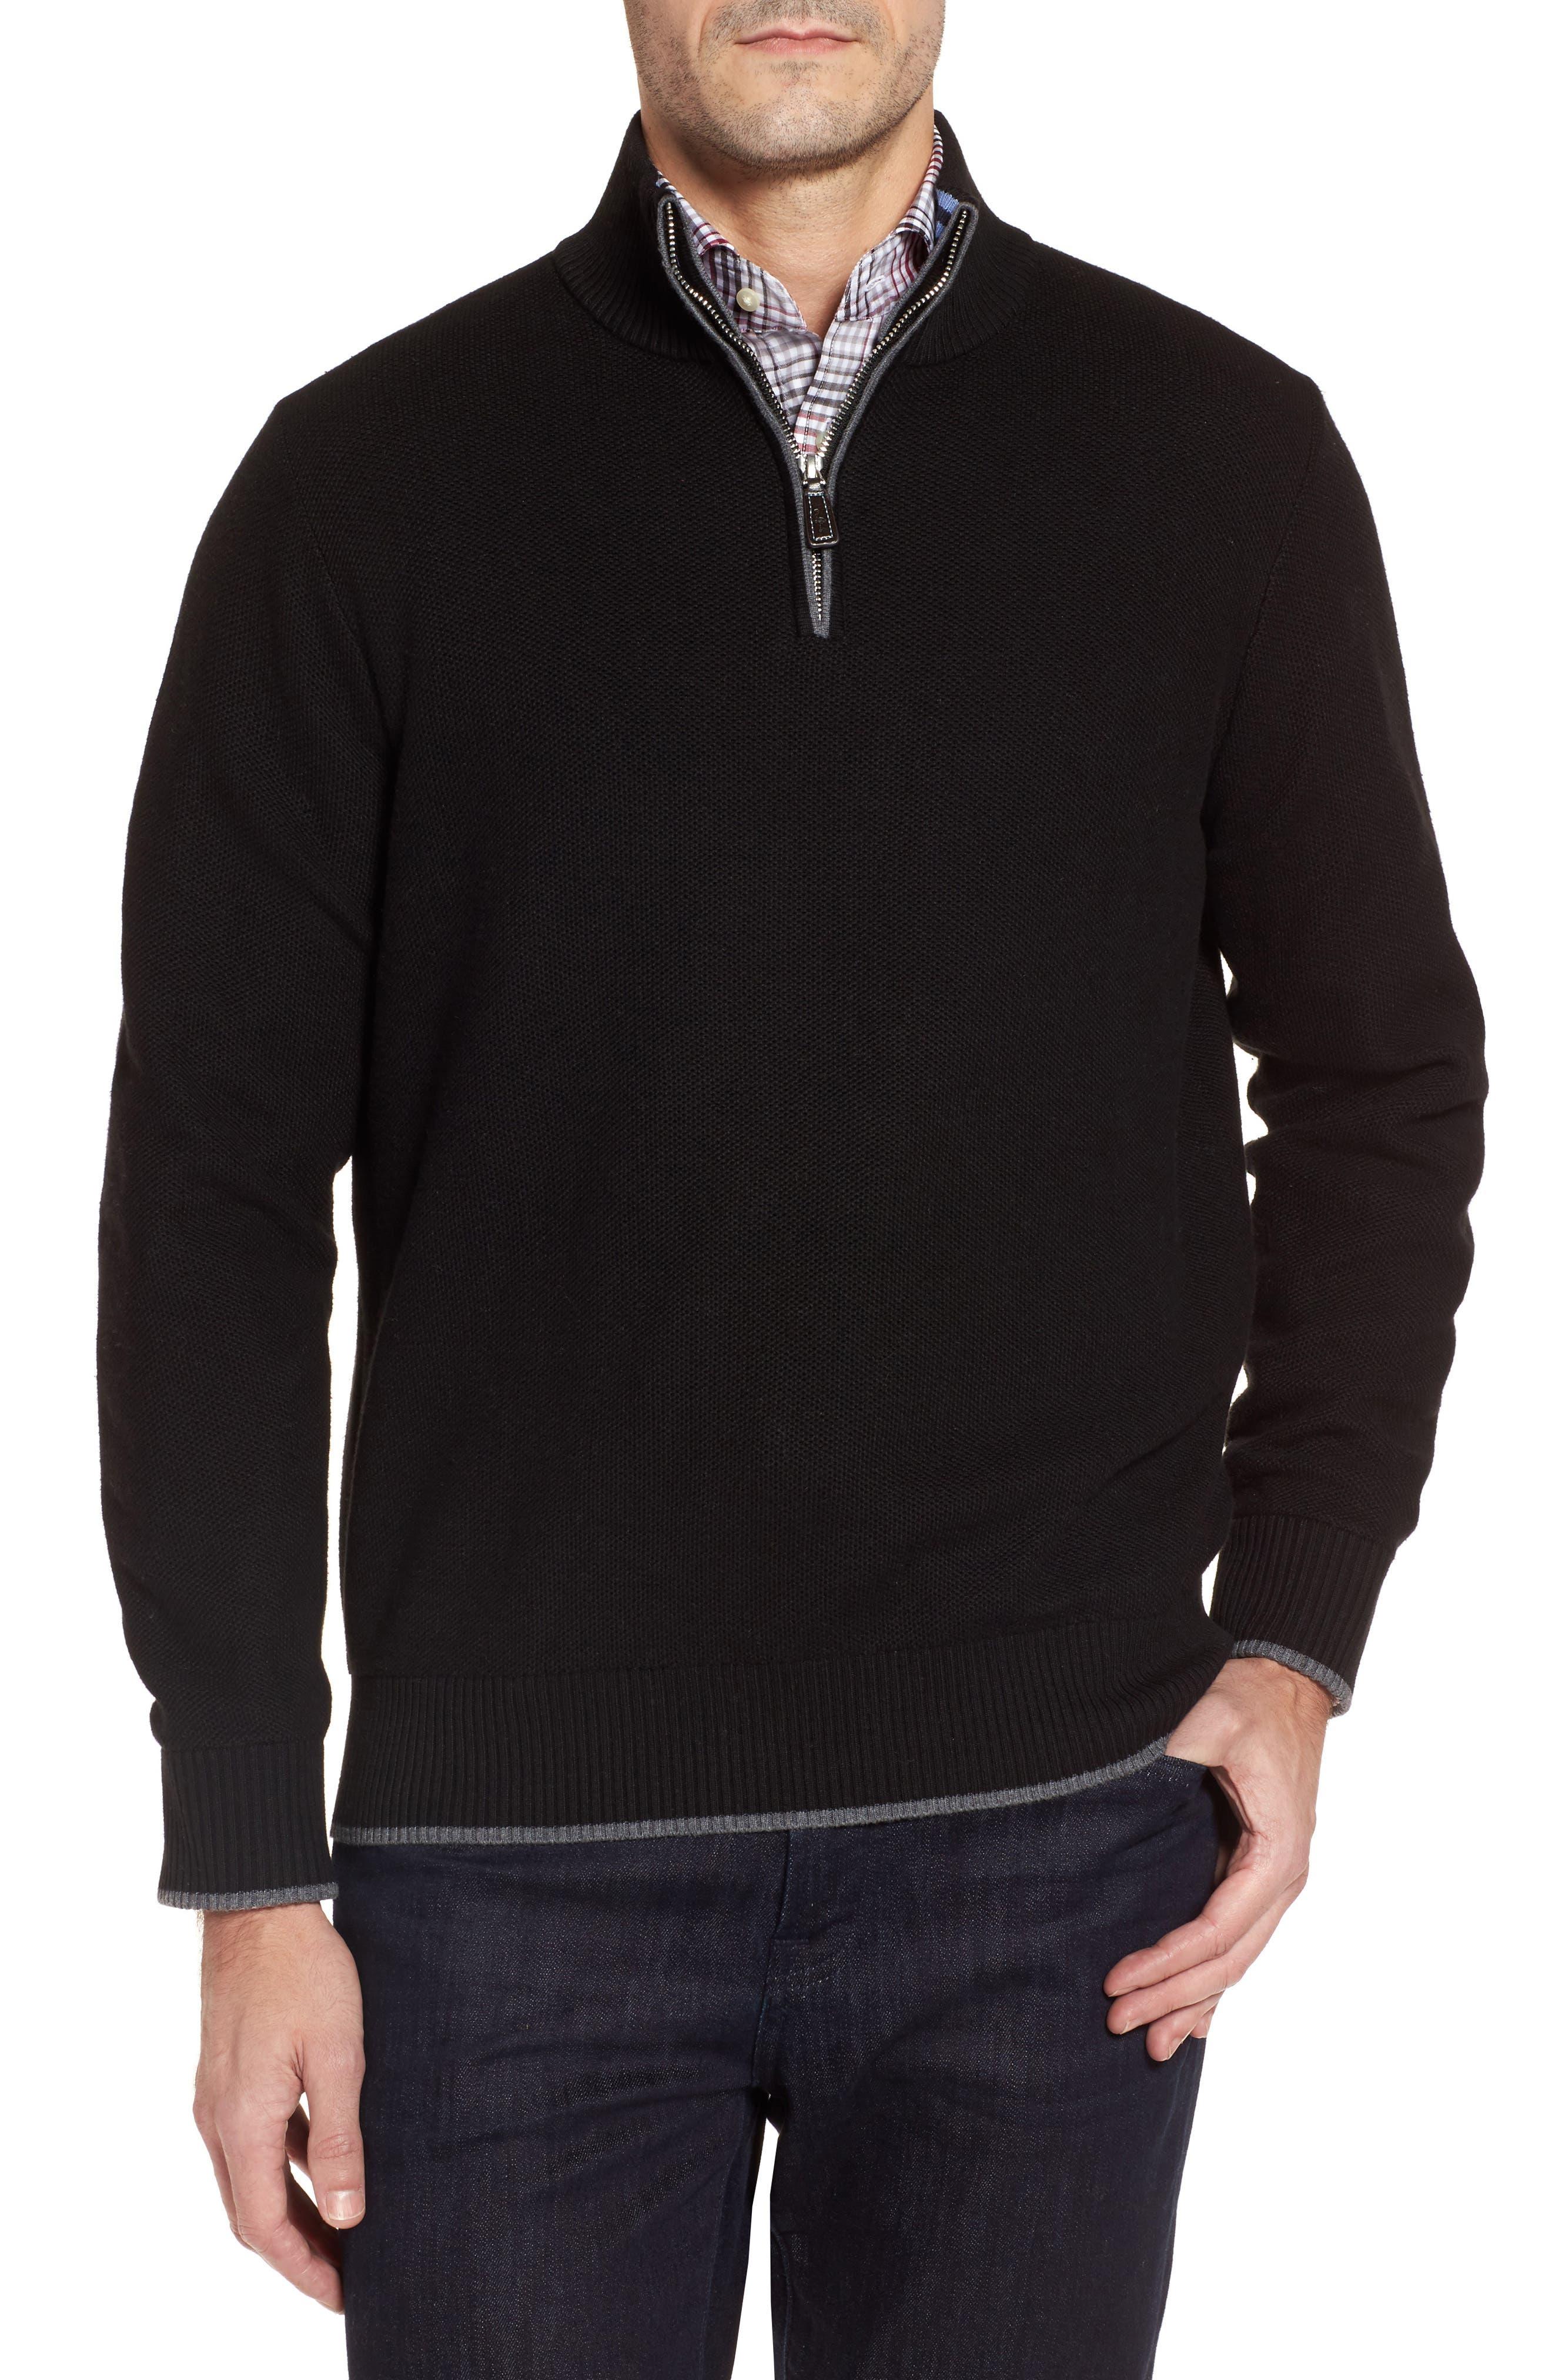 Lafitte Tipped Quarter Zip Sweater,                         Main,                         color, Black